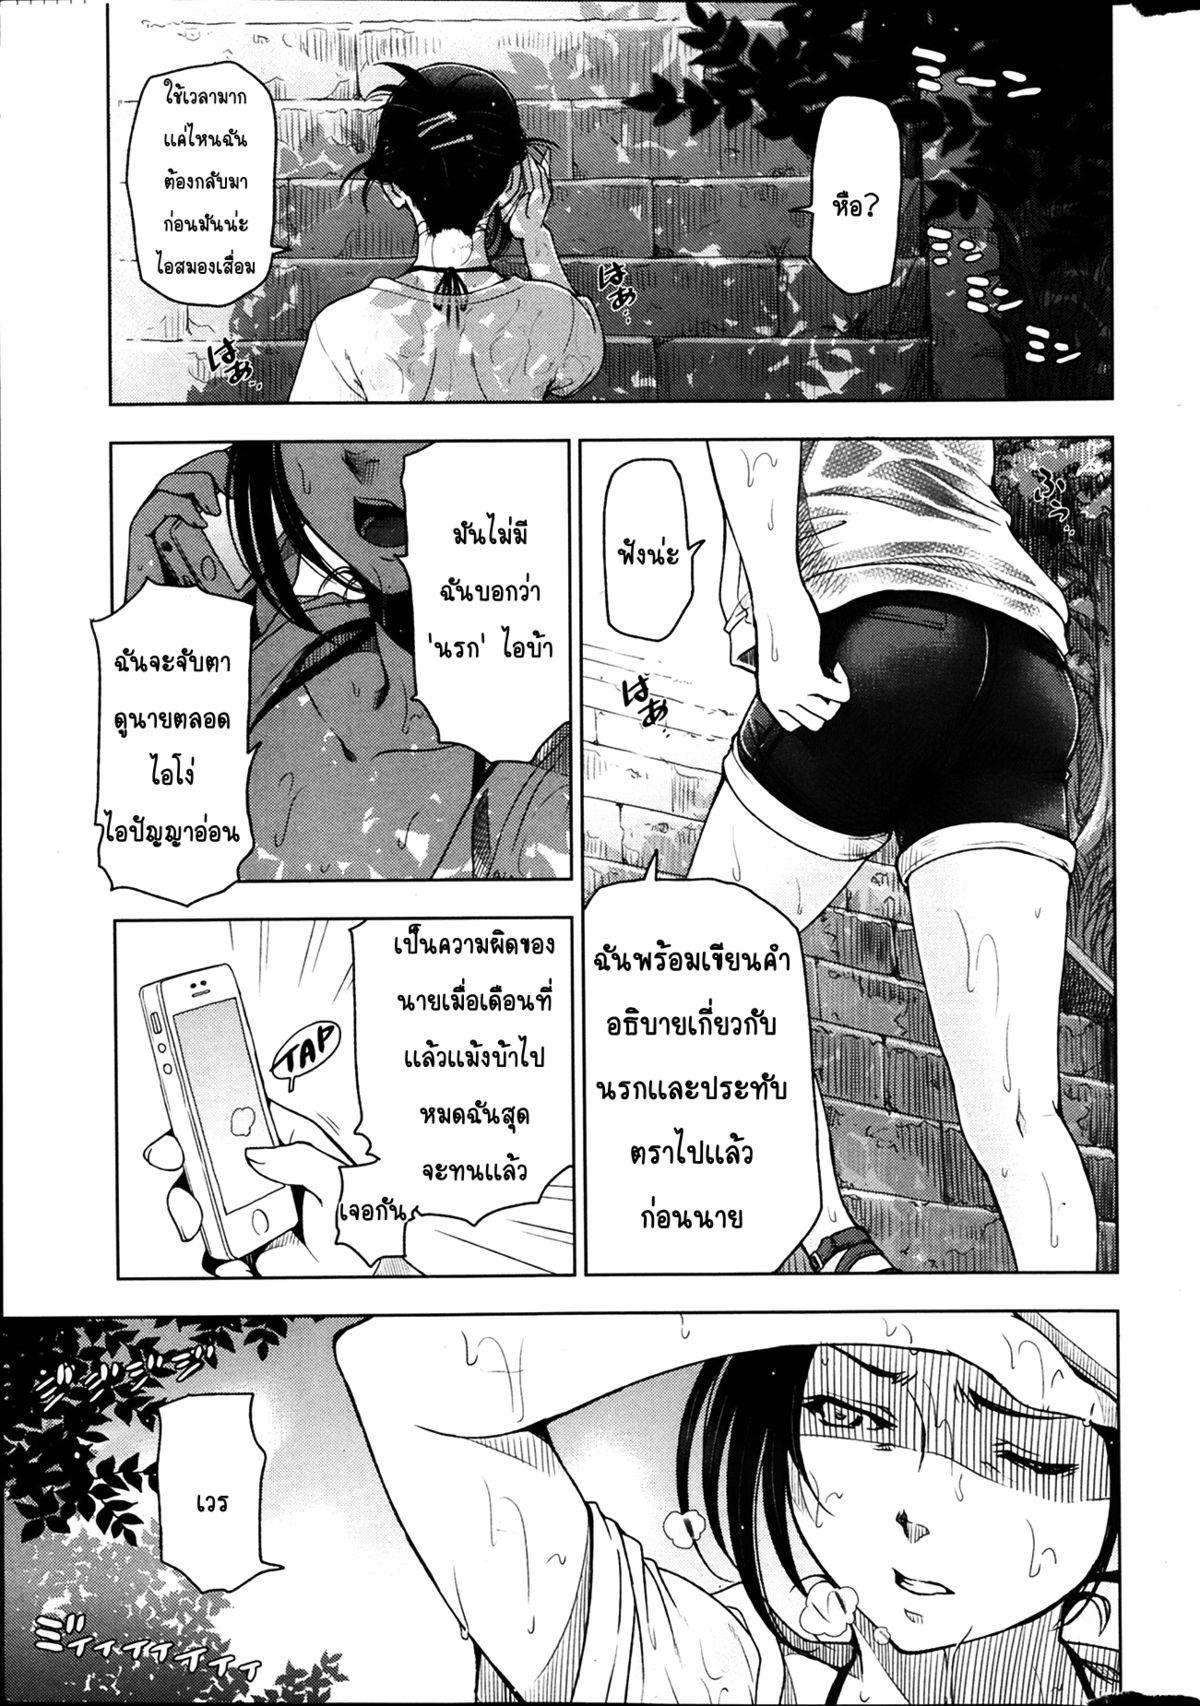 Natsu Jiru [Thai ภาษาไทย]